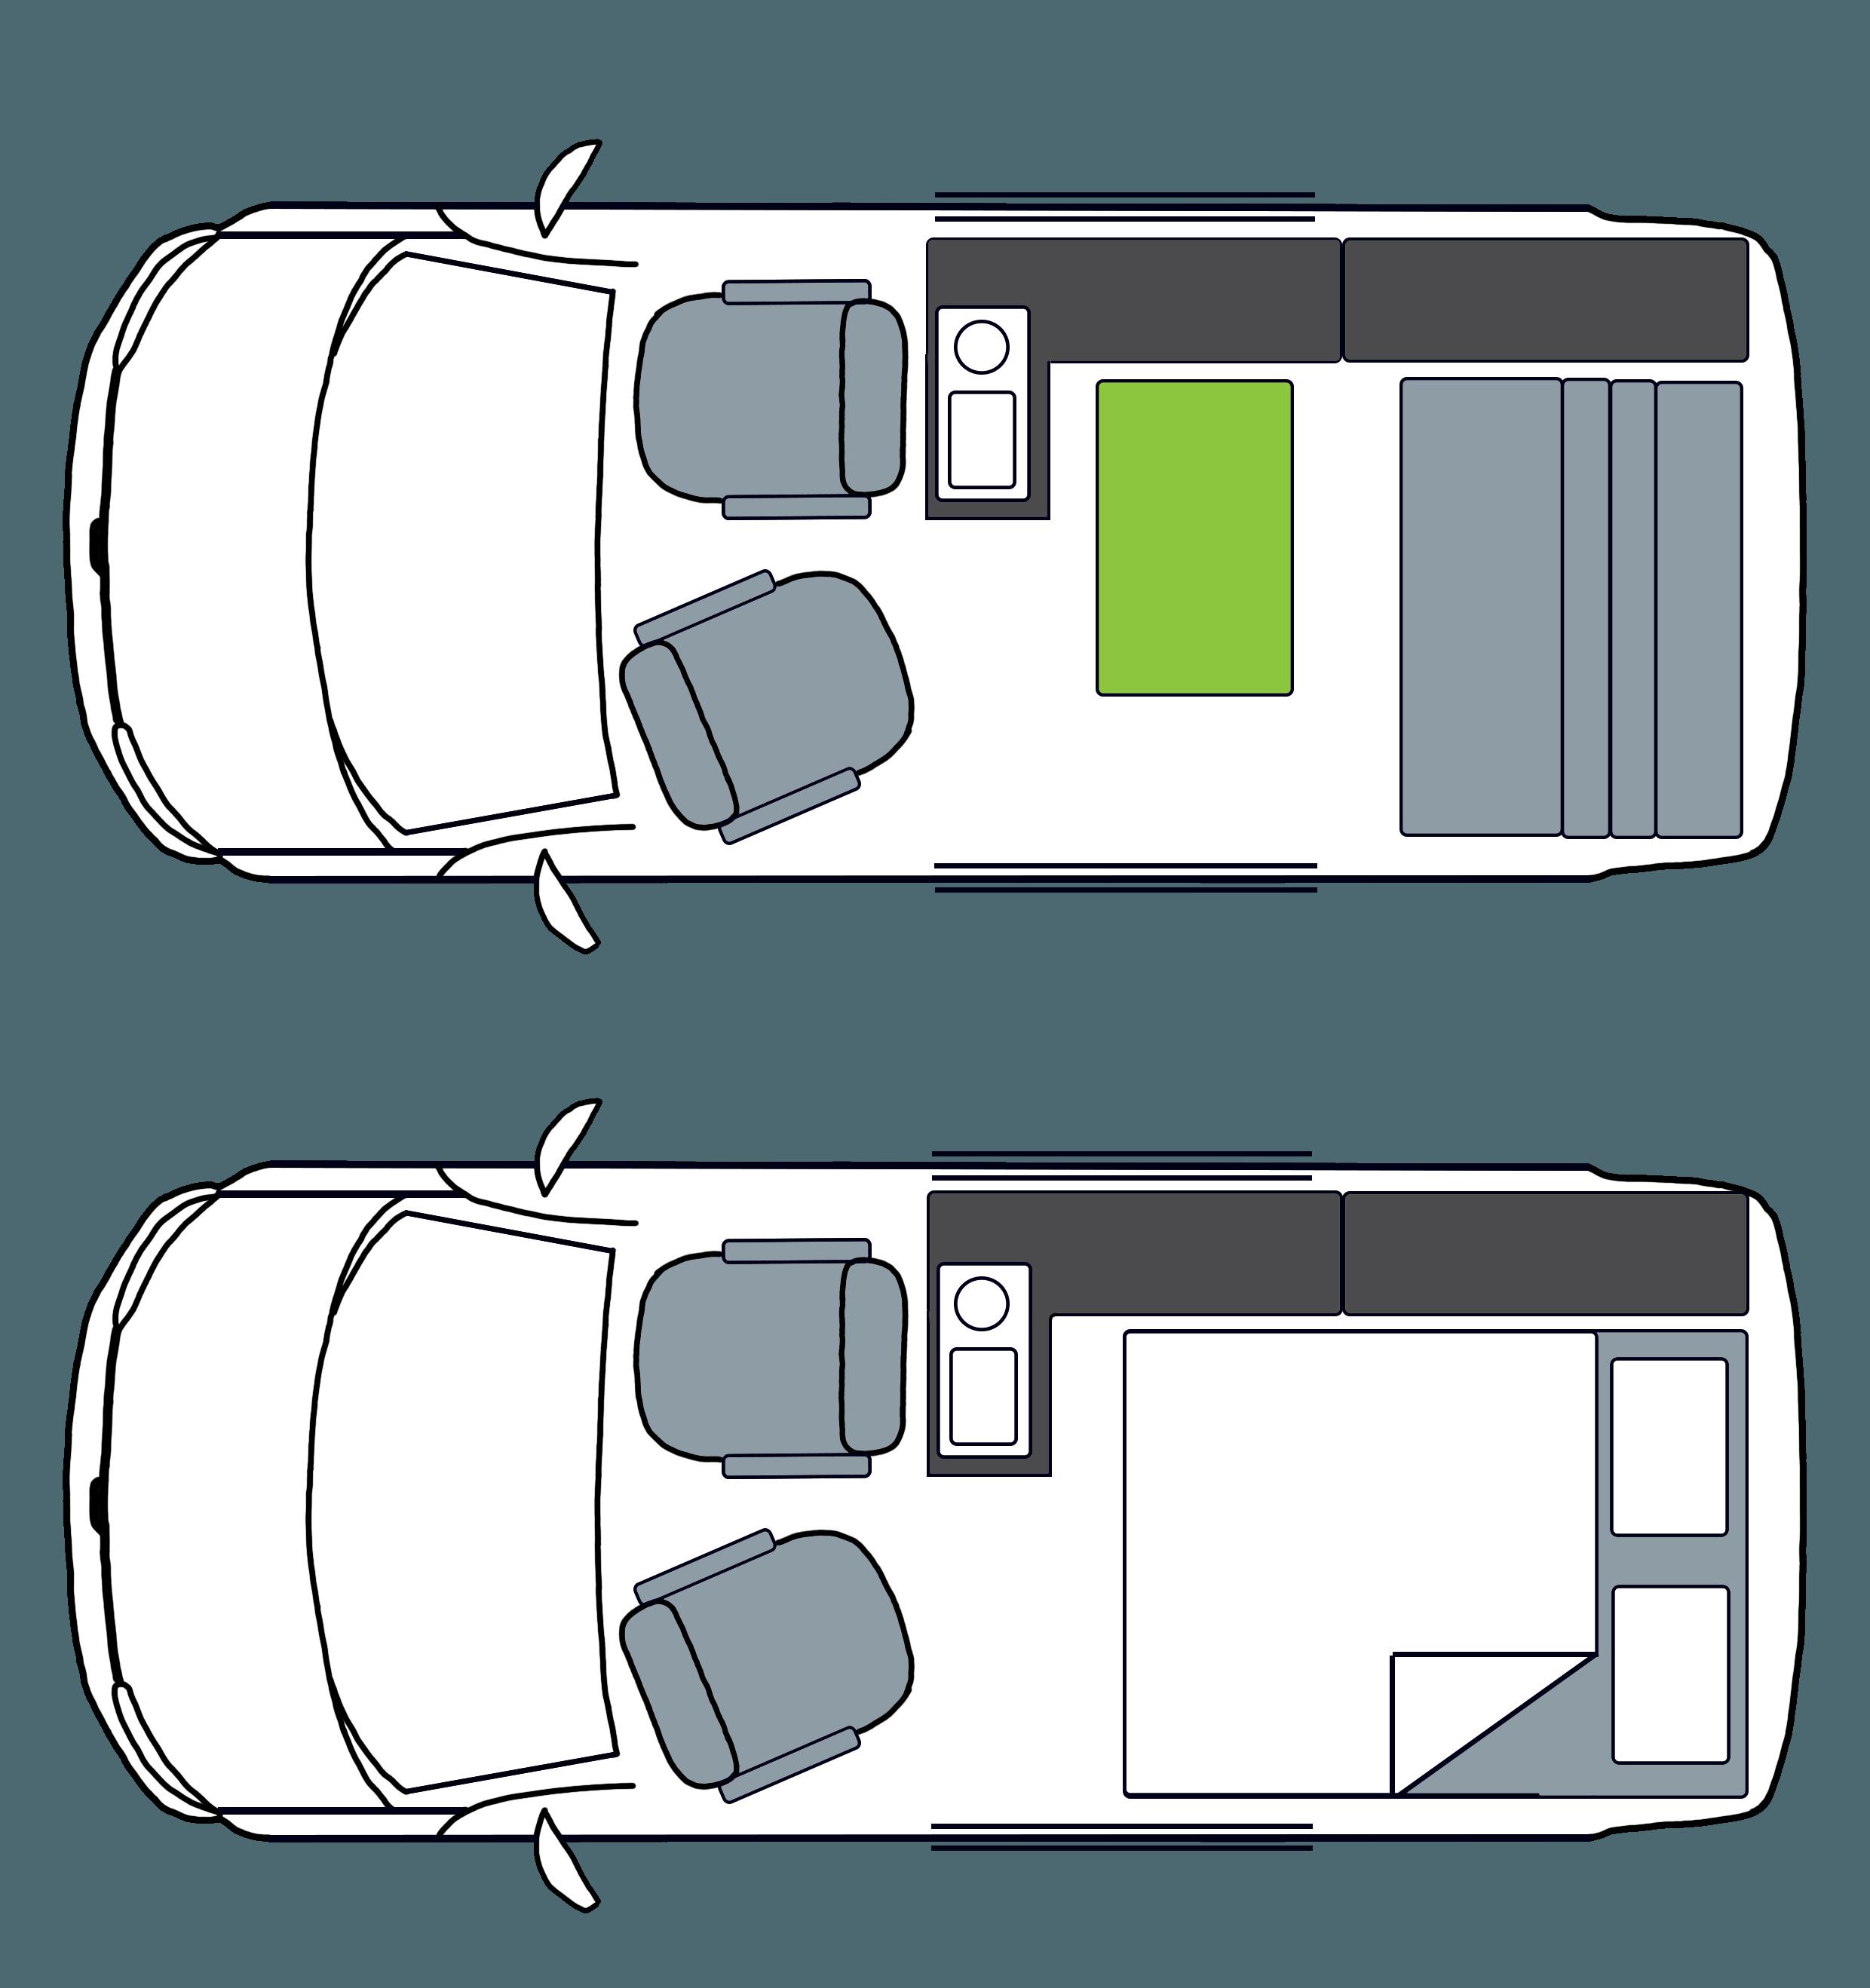 VW Vanworx Chilli Plus conversion